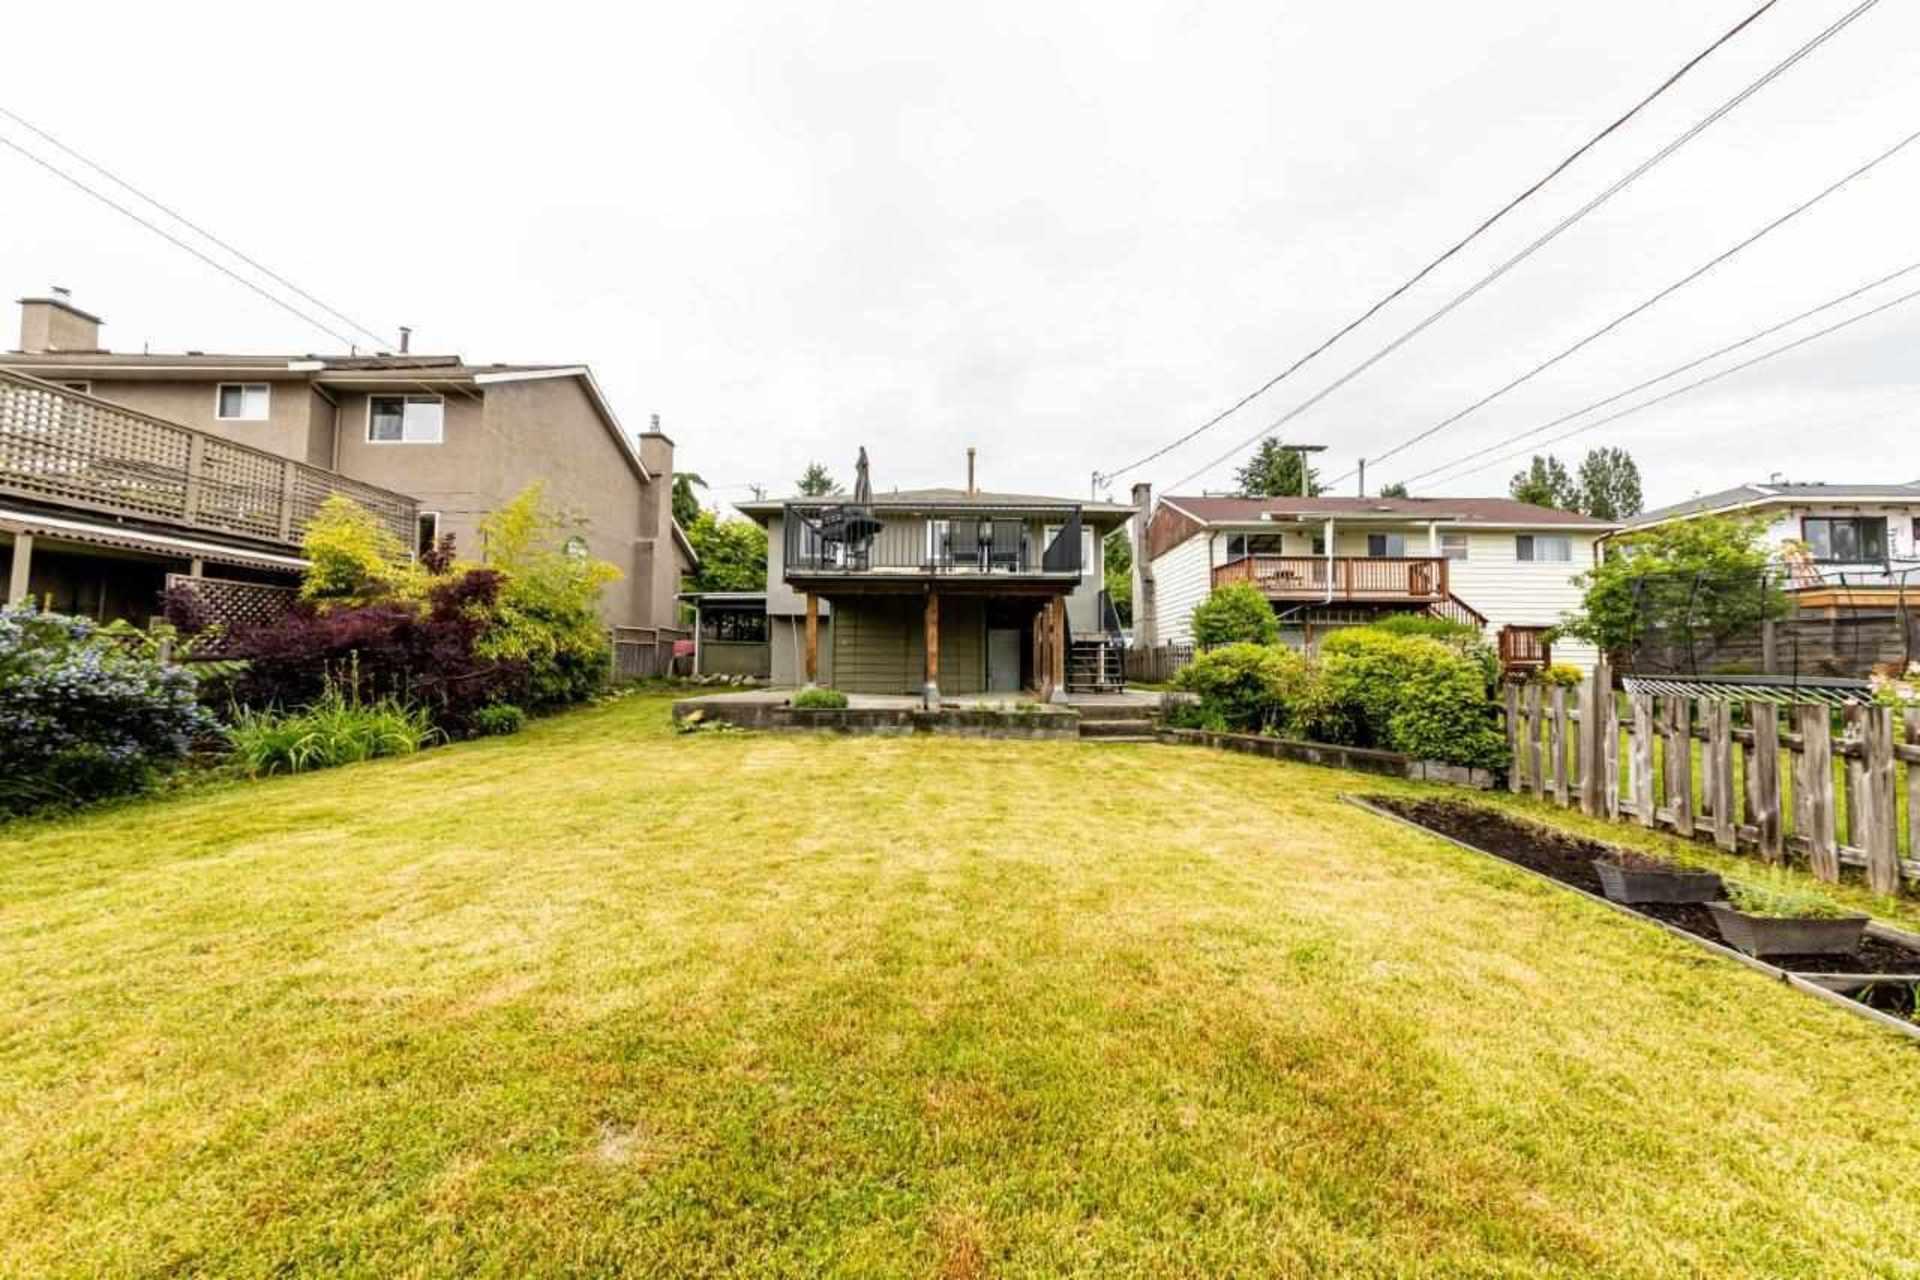 819-e-14th-street-boulevard-north-vancouver-35 at 819 E 14th Street, Boulevard, North Vancouver